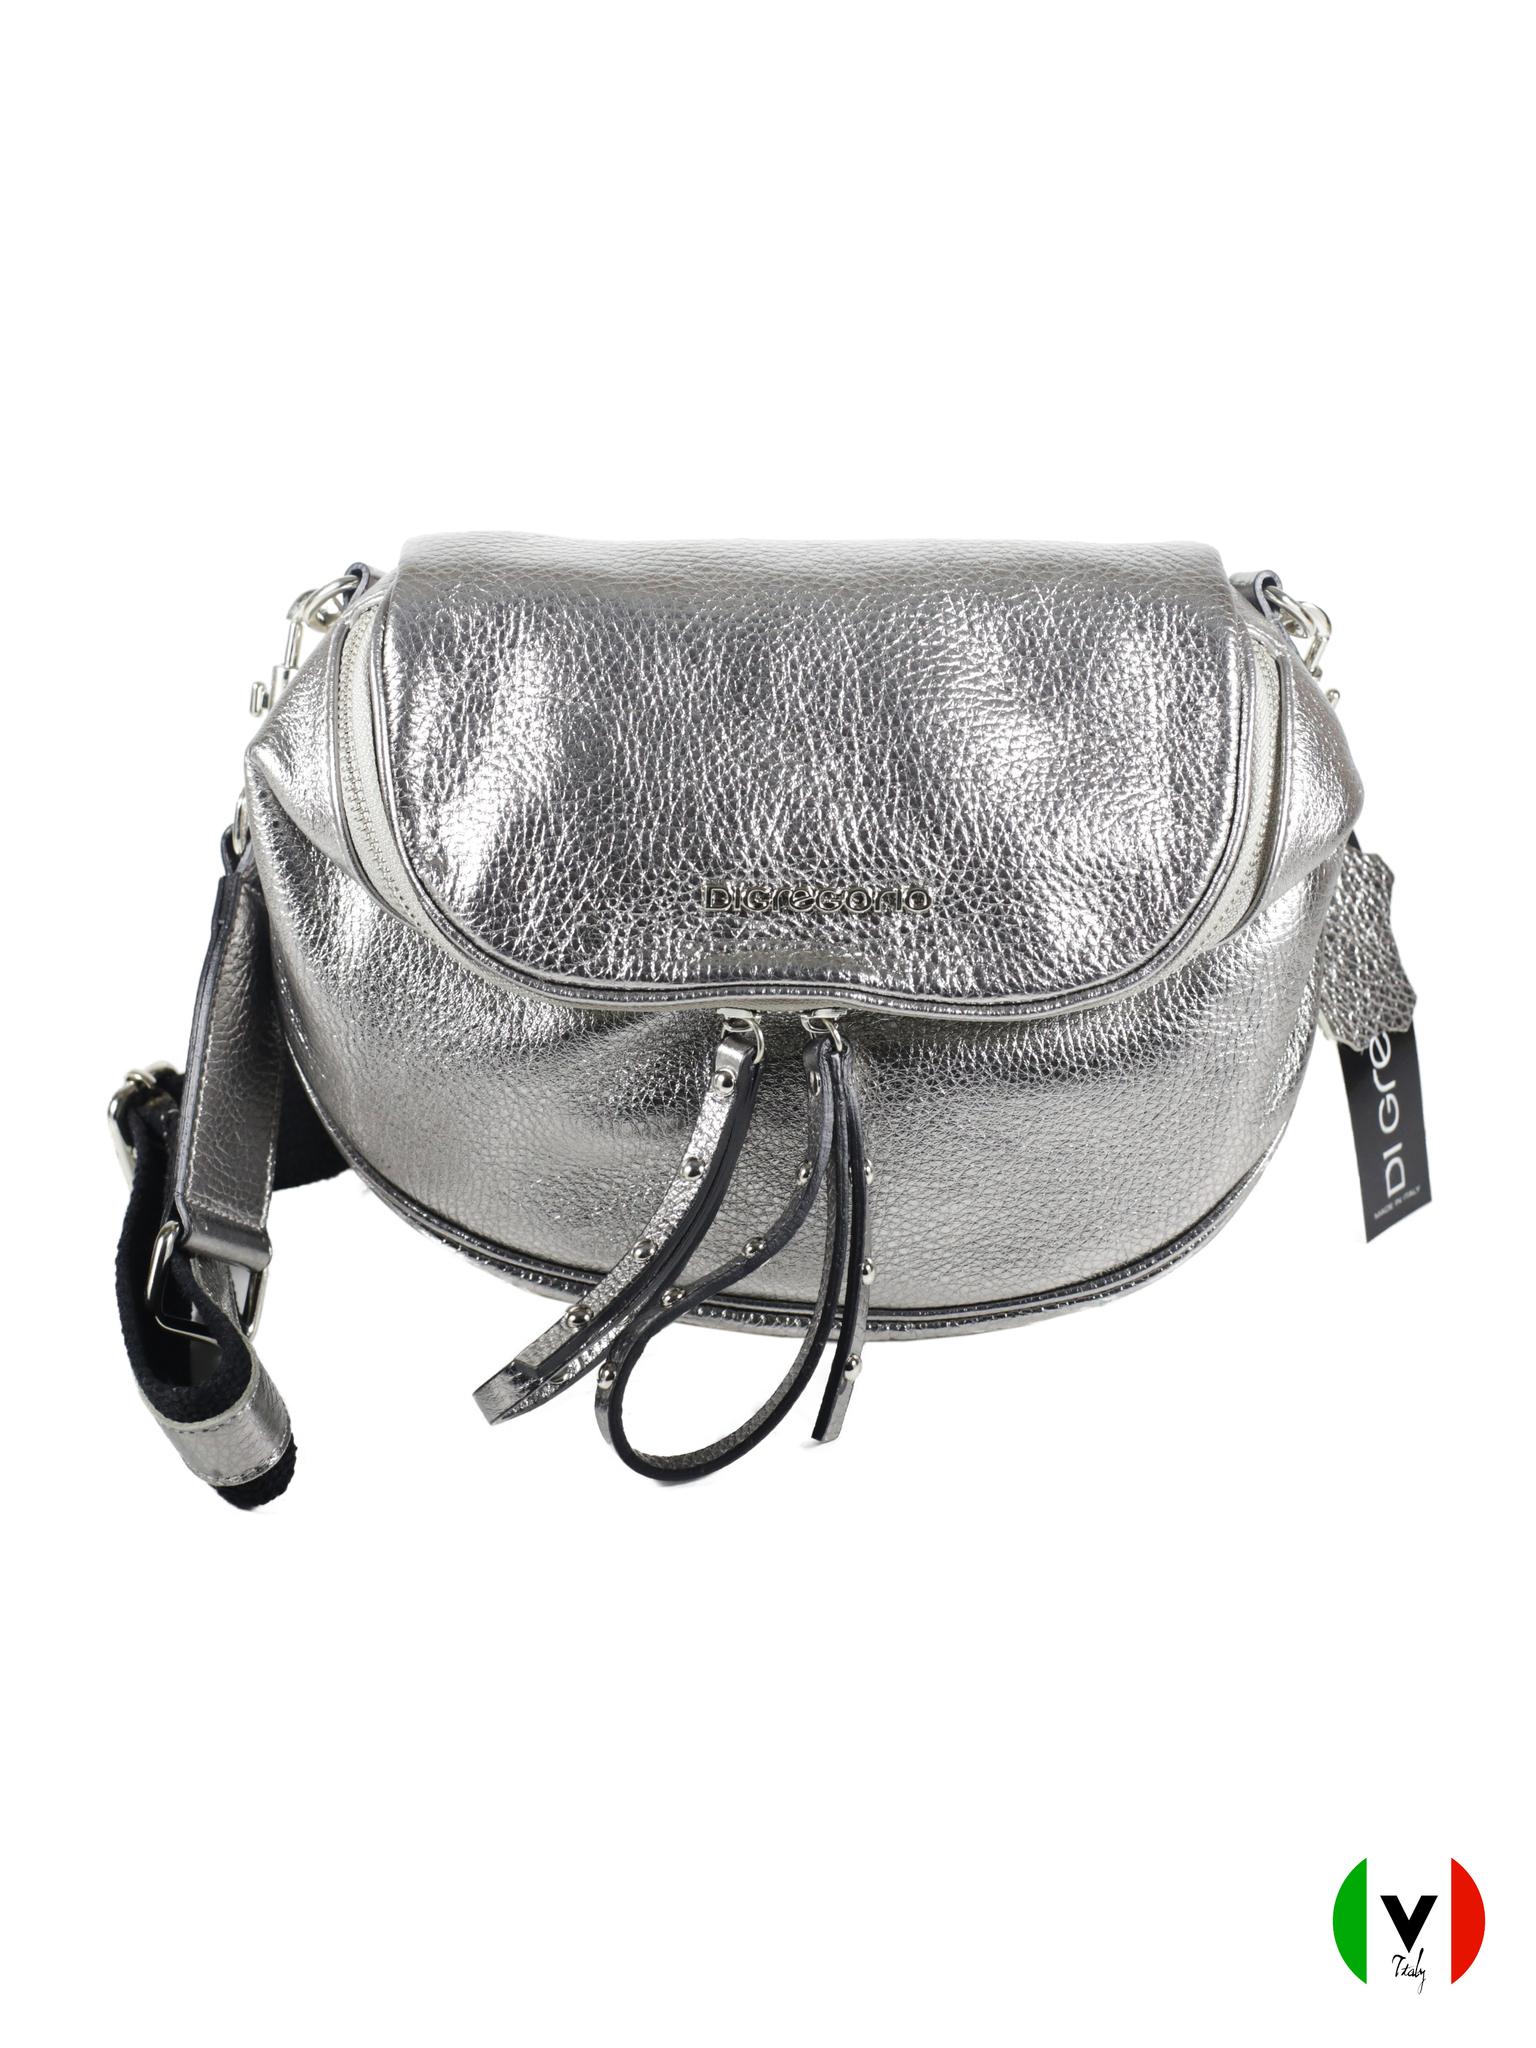 Мягкая сумка Di Gregorio серебряного цвета 8683-silver, артикул 8683-silver, цвет чёрный, цена 10 500 руб., veroitaly.ru